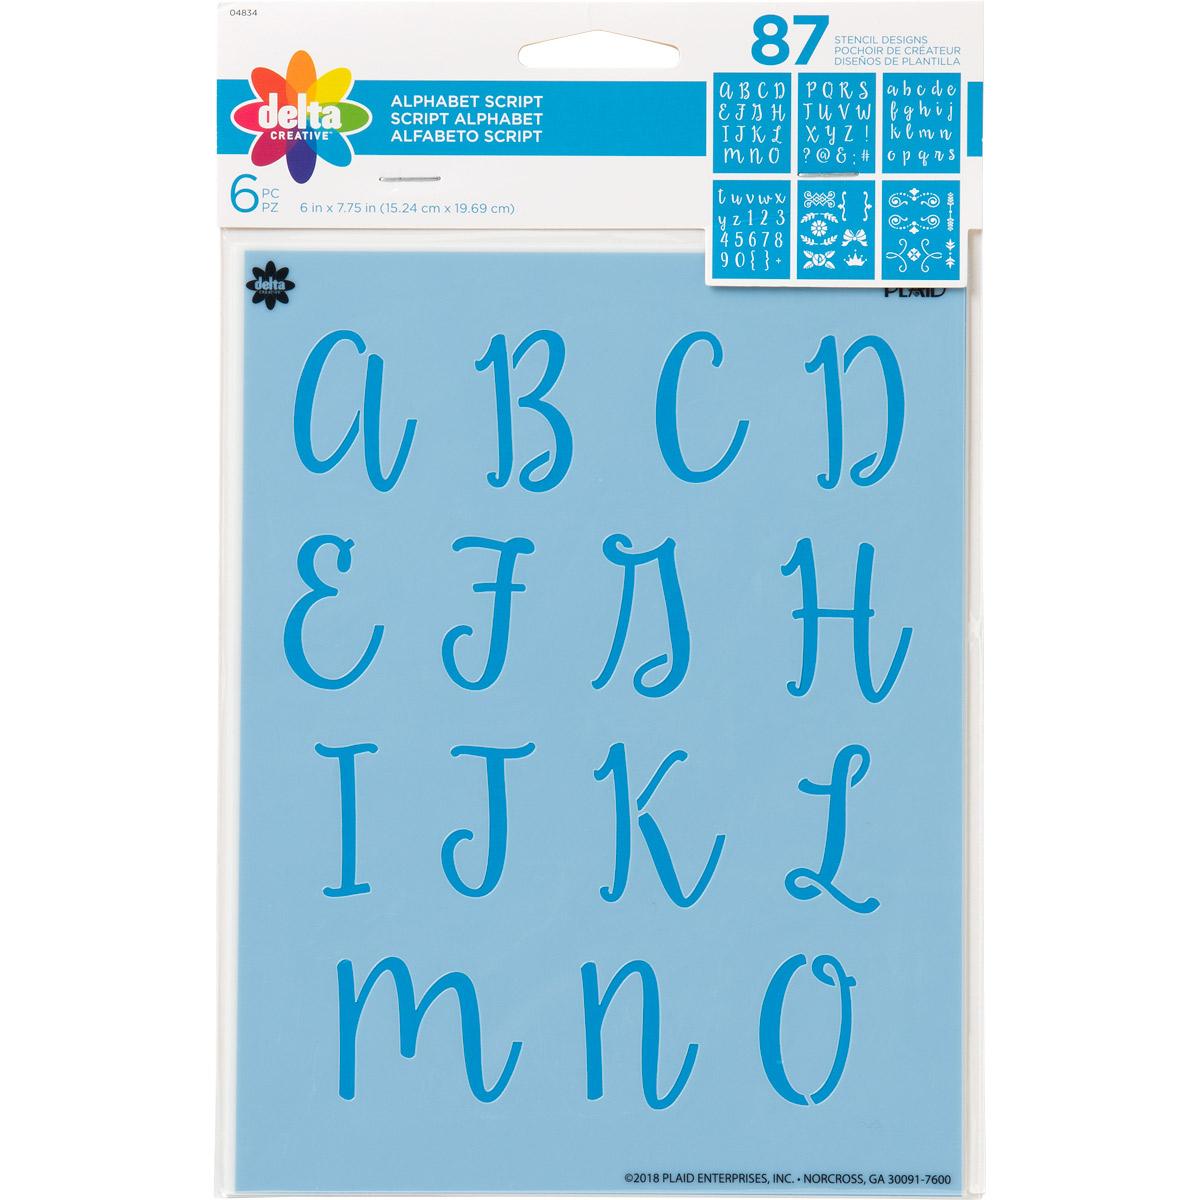 Delta Creative™ Stencil - Alphabet Script